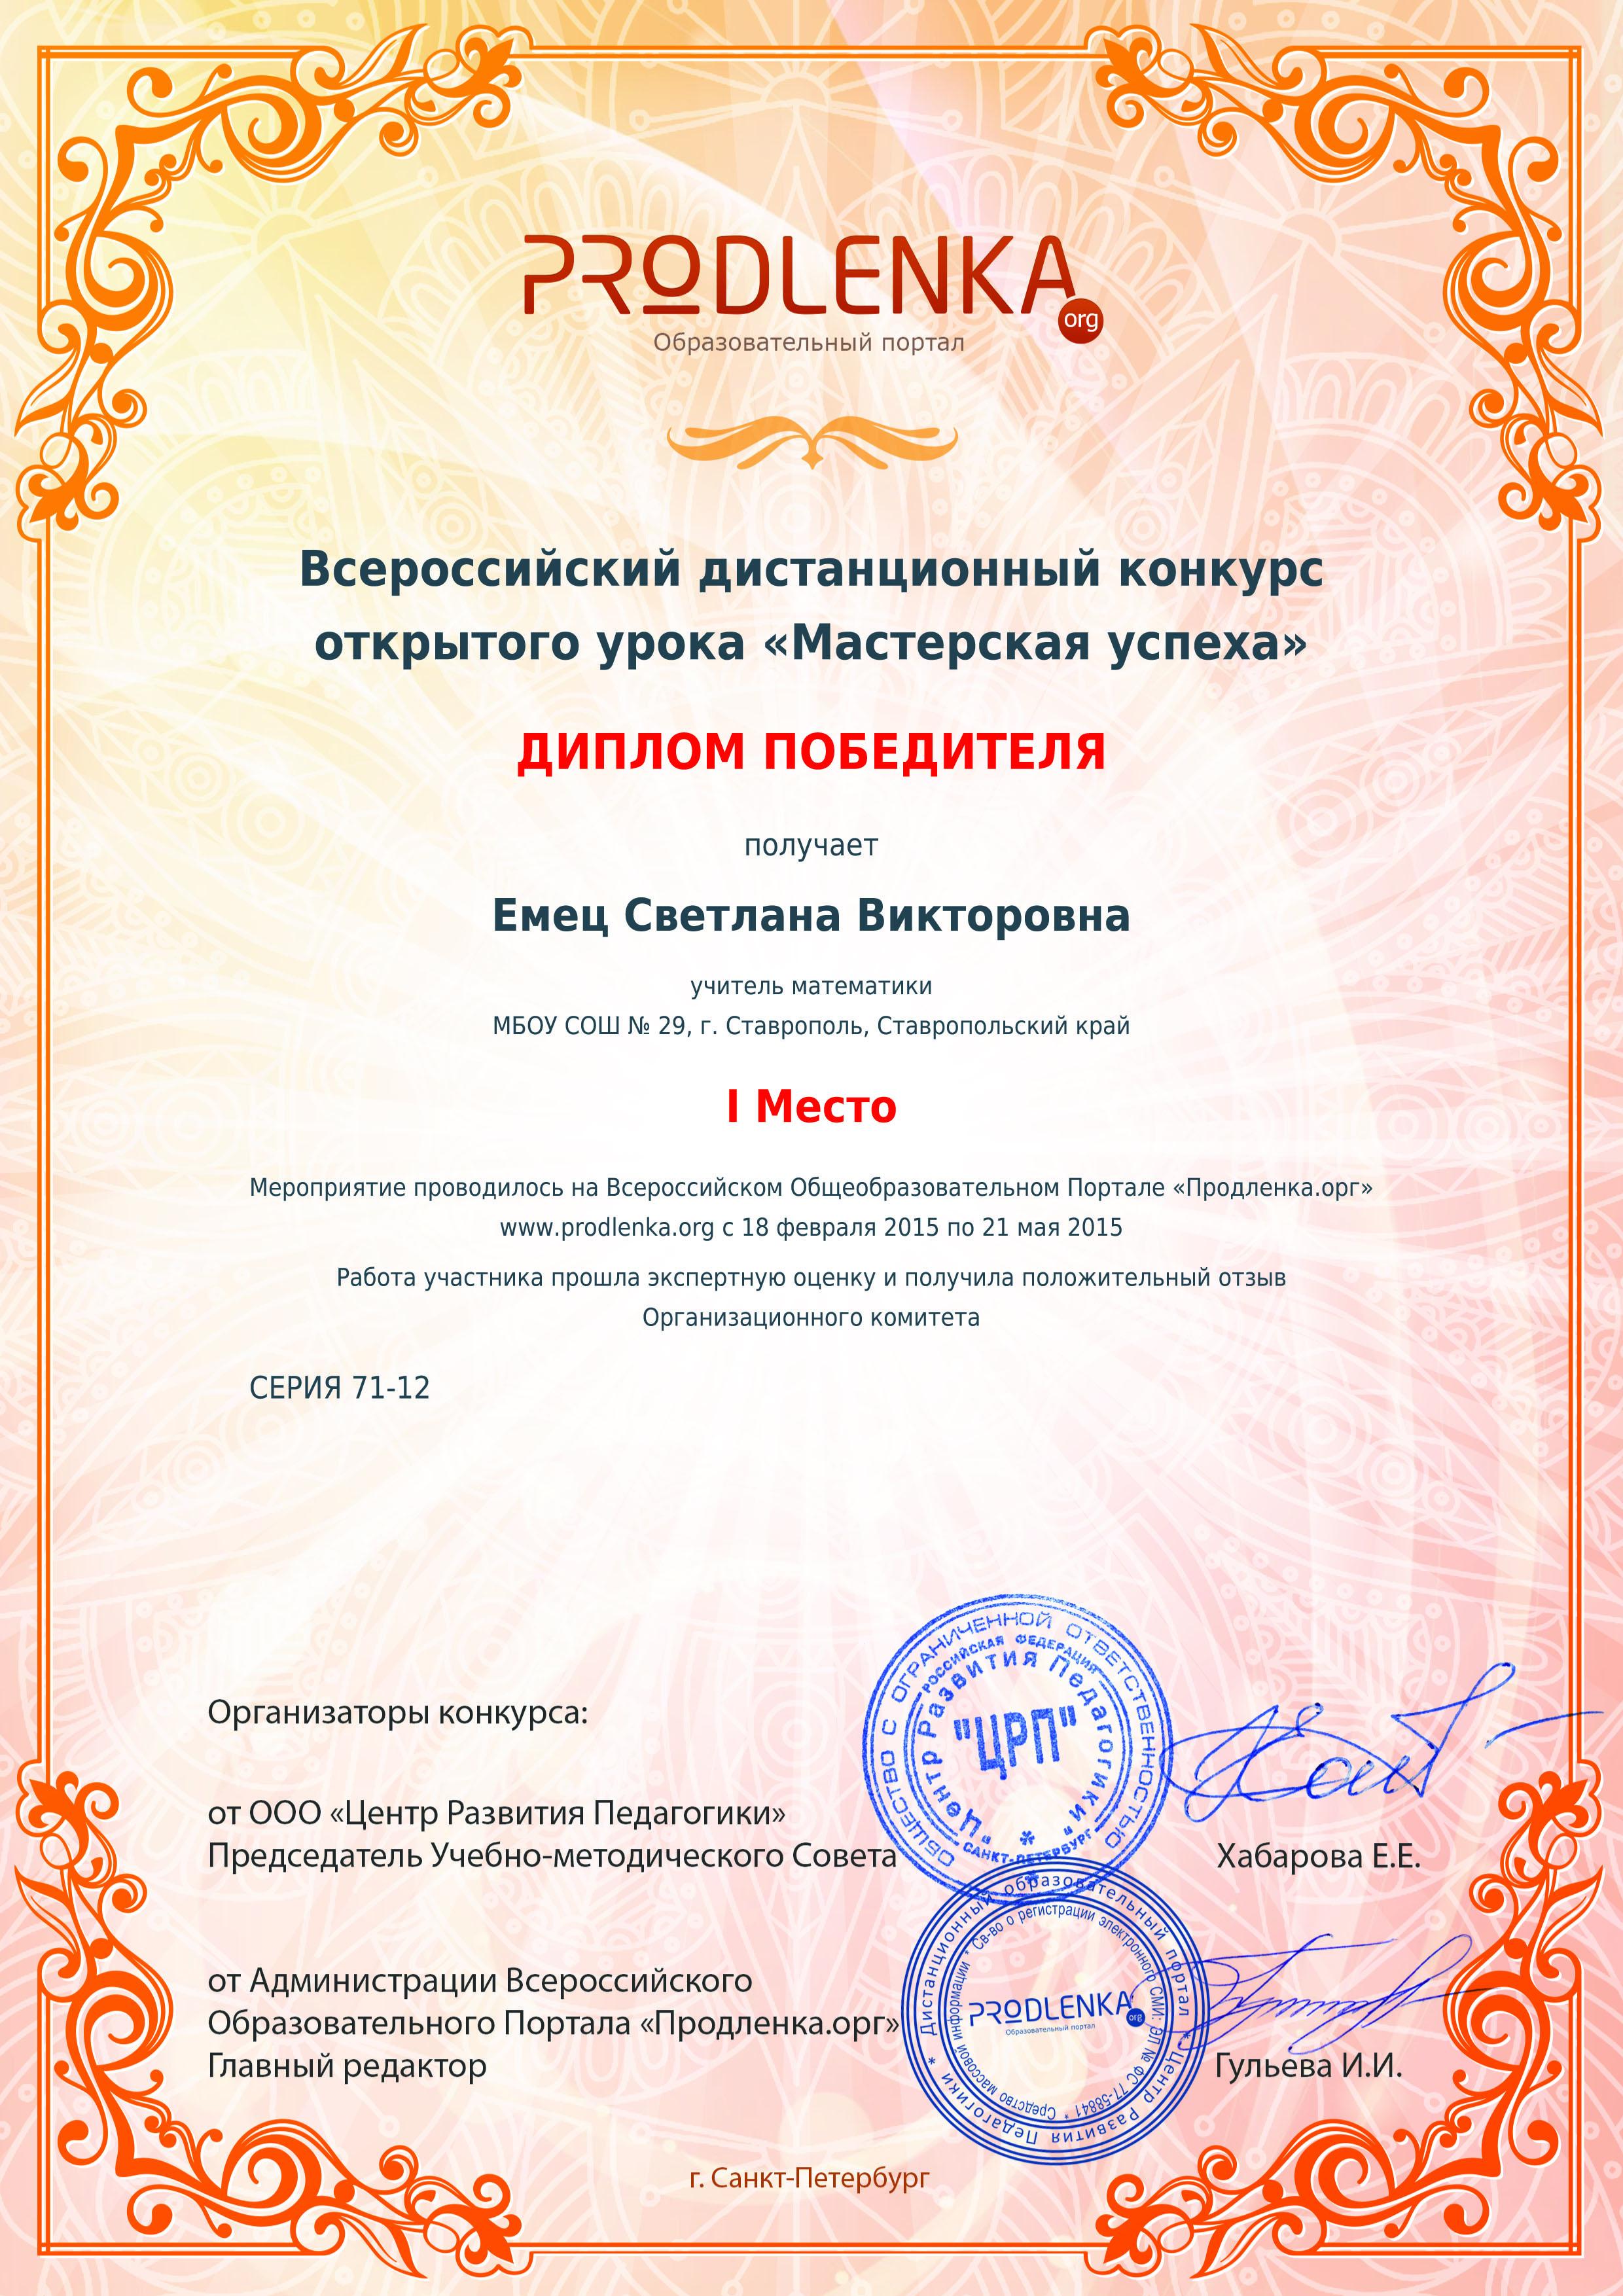 Www video rus ru положение конкурса на июнь 2017